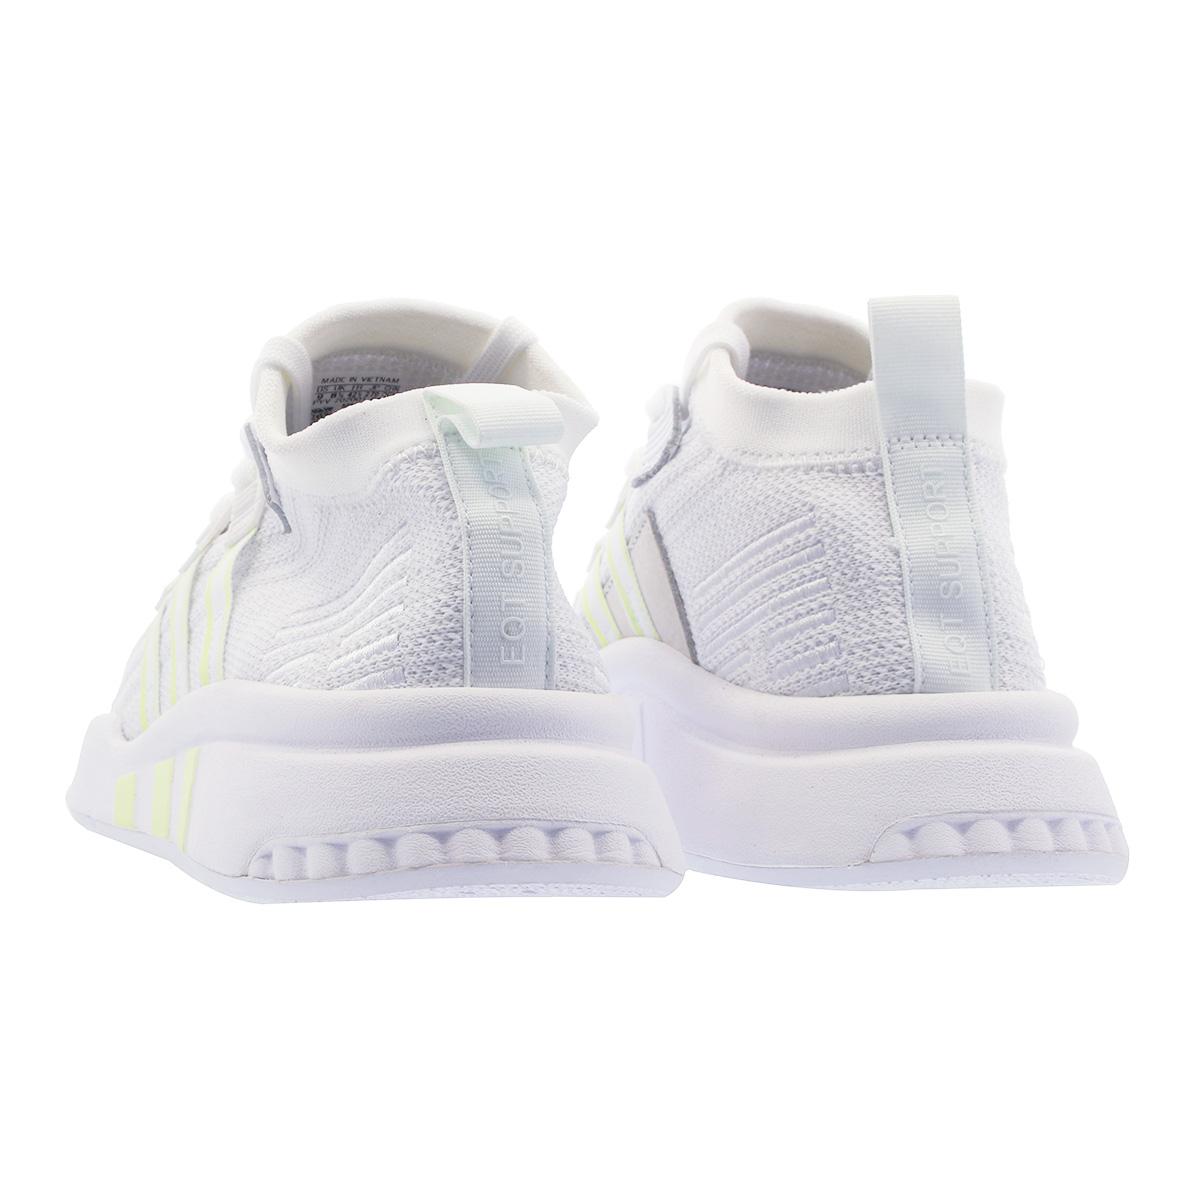 buy popular fdf7f 75fb0 adidas EQT SUPPORT MID ADV PK Adidas EQT support mid ADV PK RUNNING WHITECRYSTAL  WHITEENERGY INK b37455